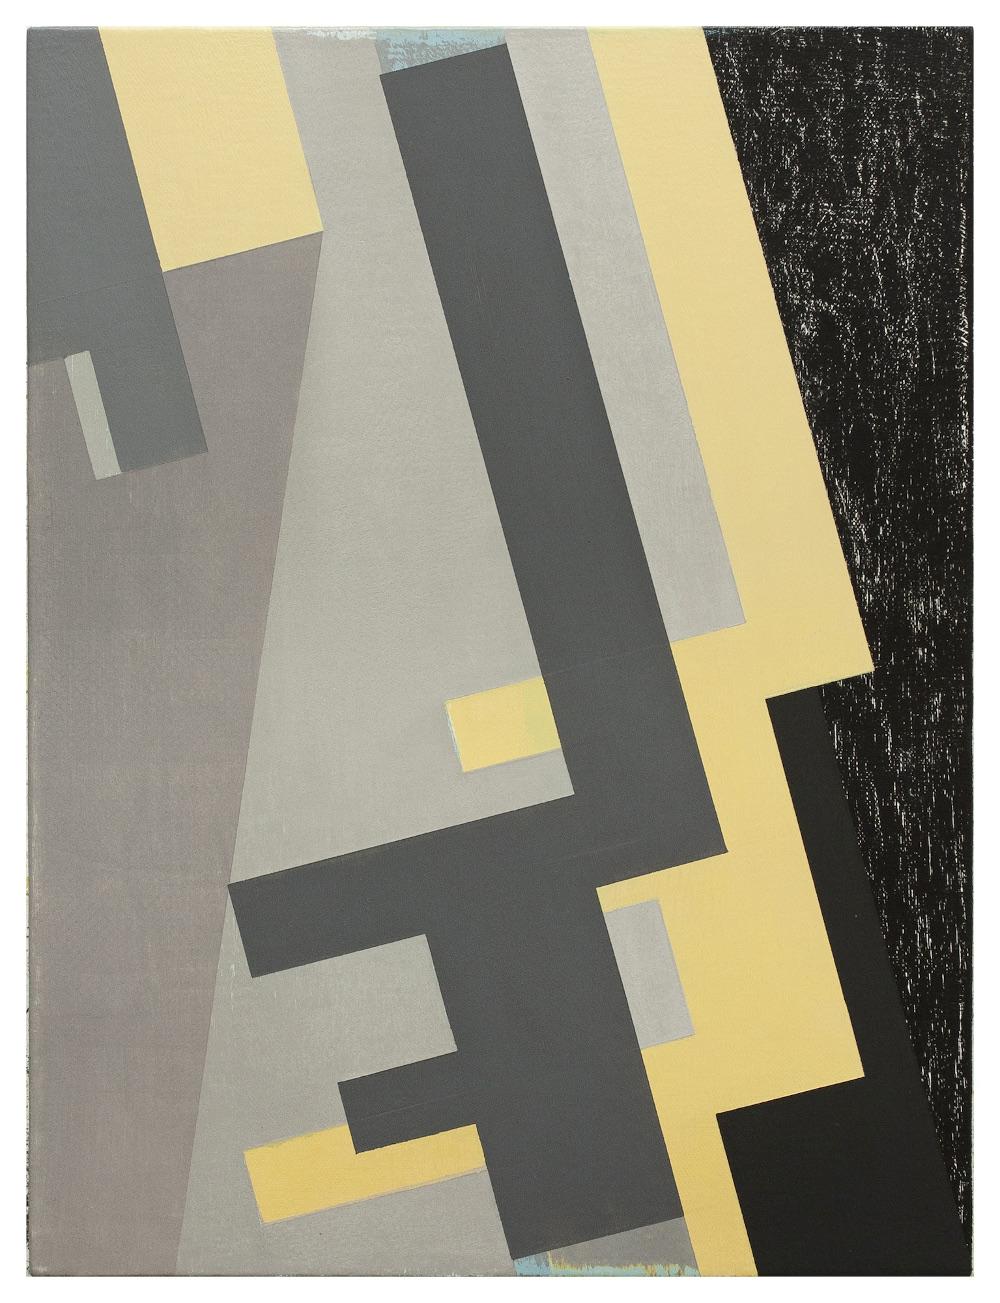 Mr Bauhaus (construction), 2015